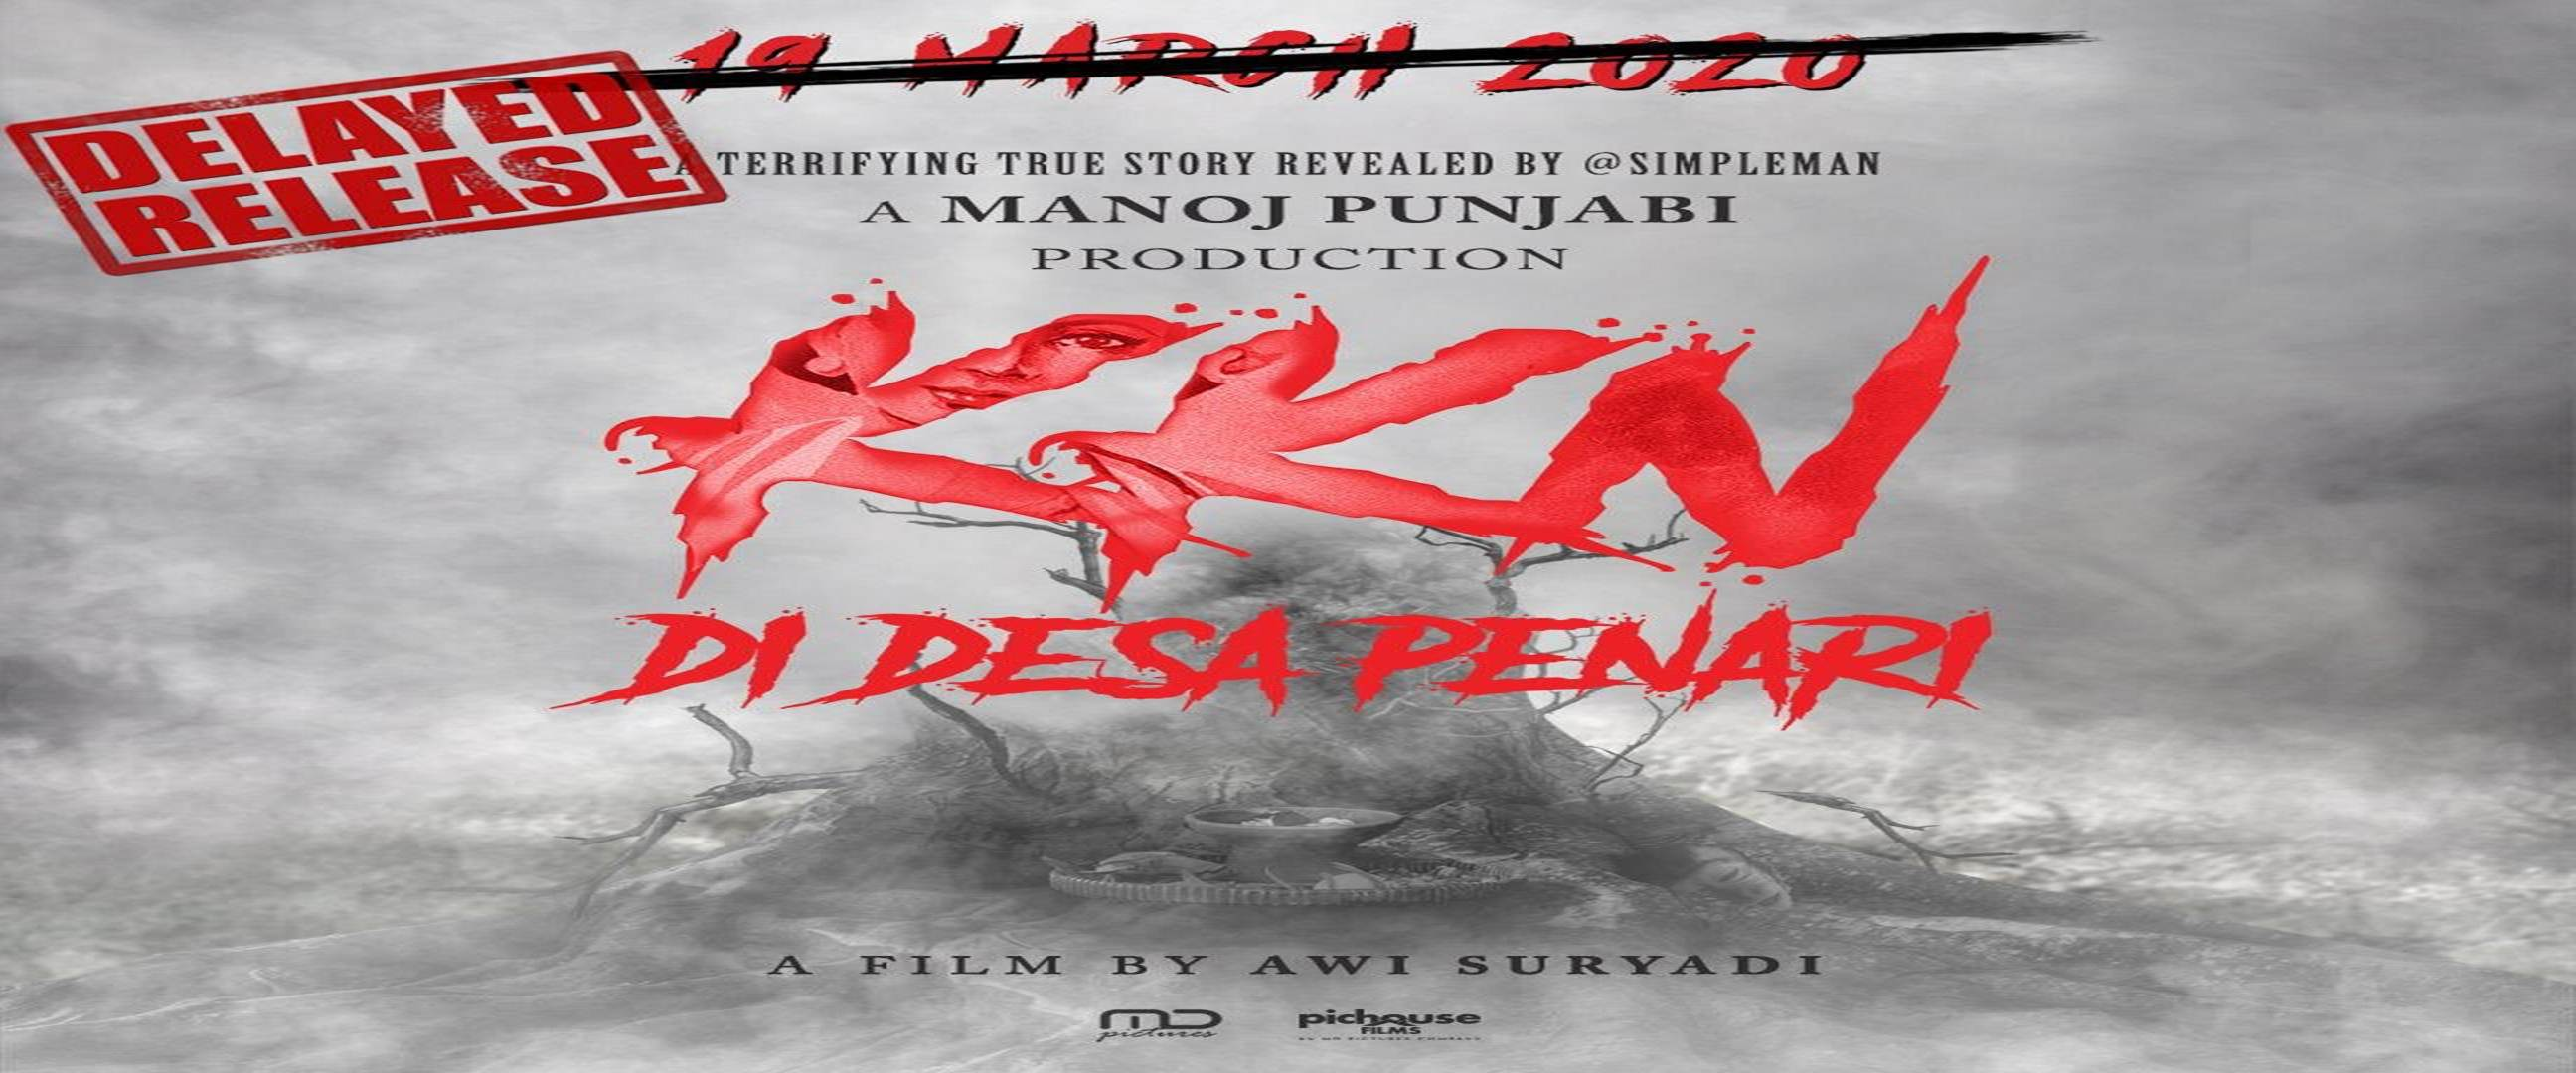 10 Reaksi warganet usai penundaan rilis film KKN di Desa Penari